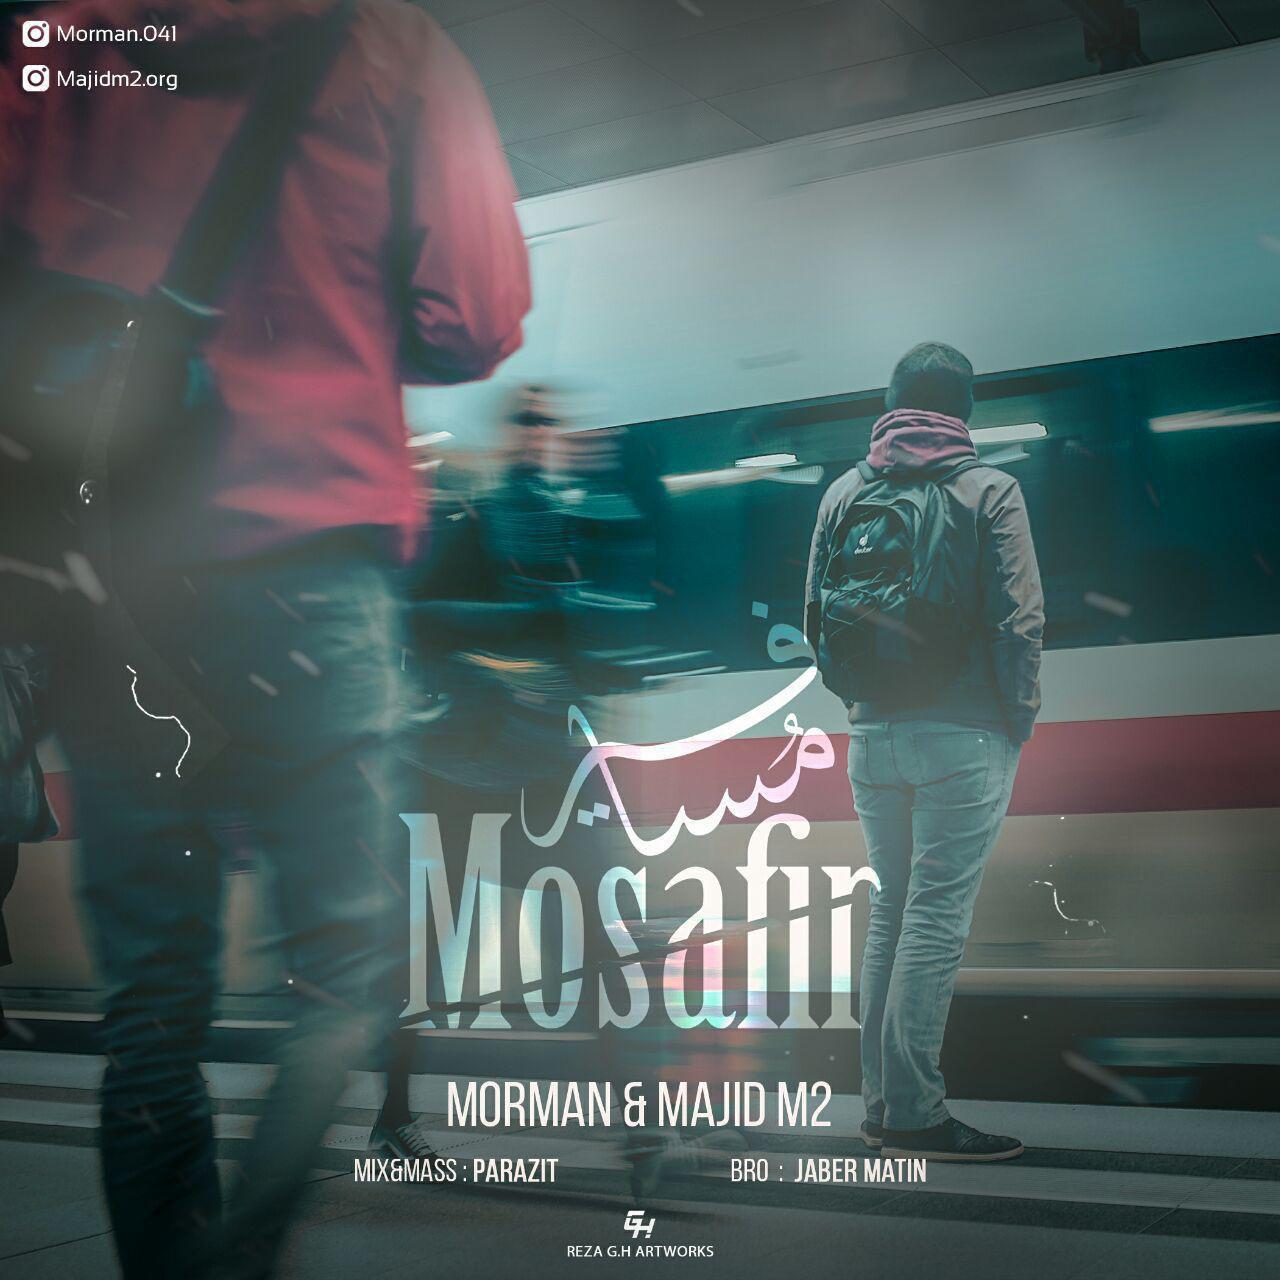 http://s5.picofile.com/file/8369689468/11Morman_Feat_Majid_M2_Mosafir.jpg